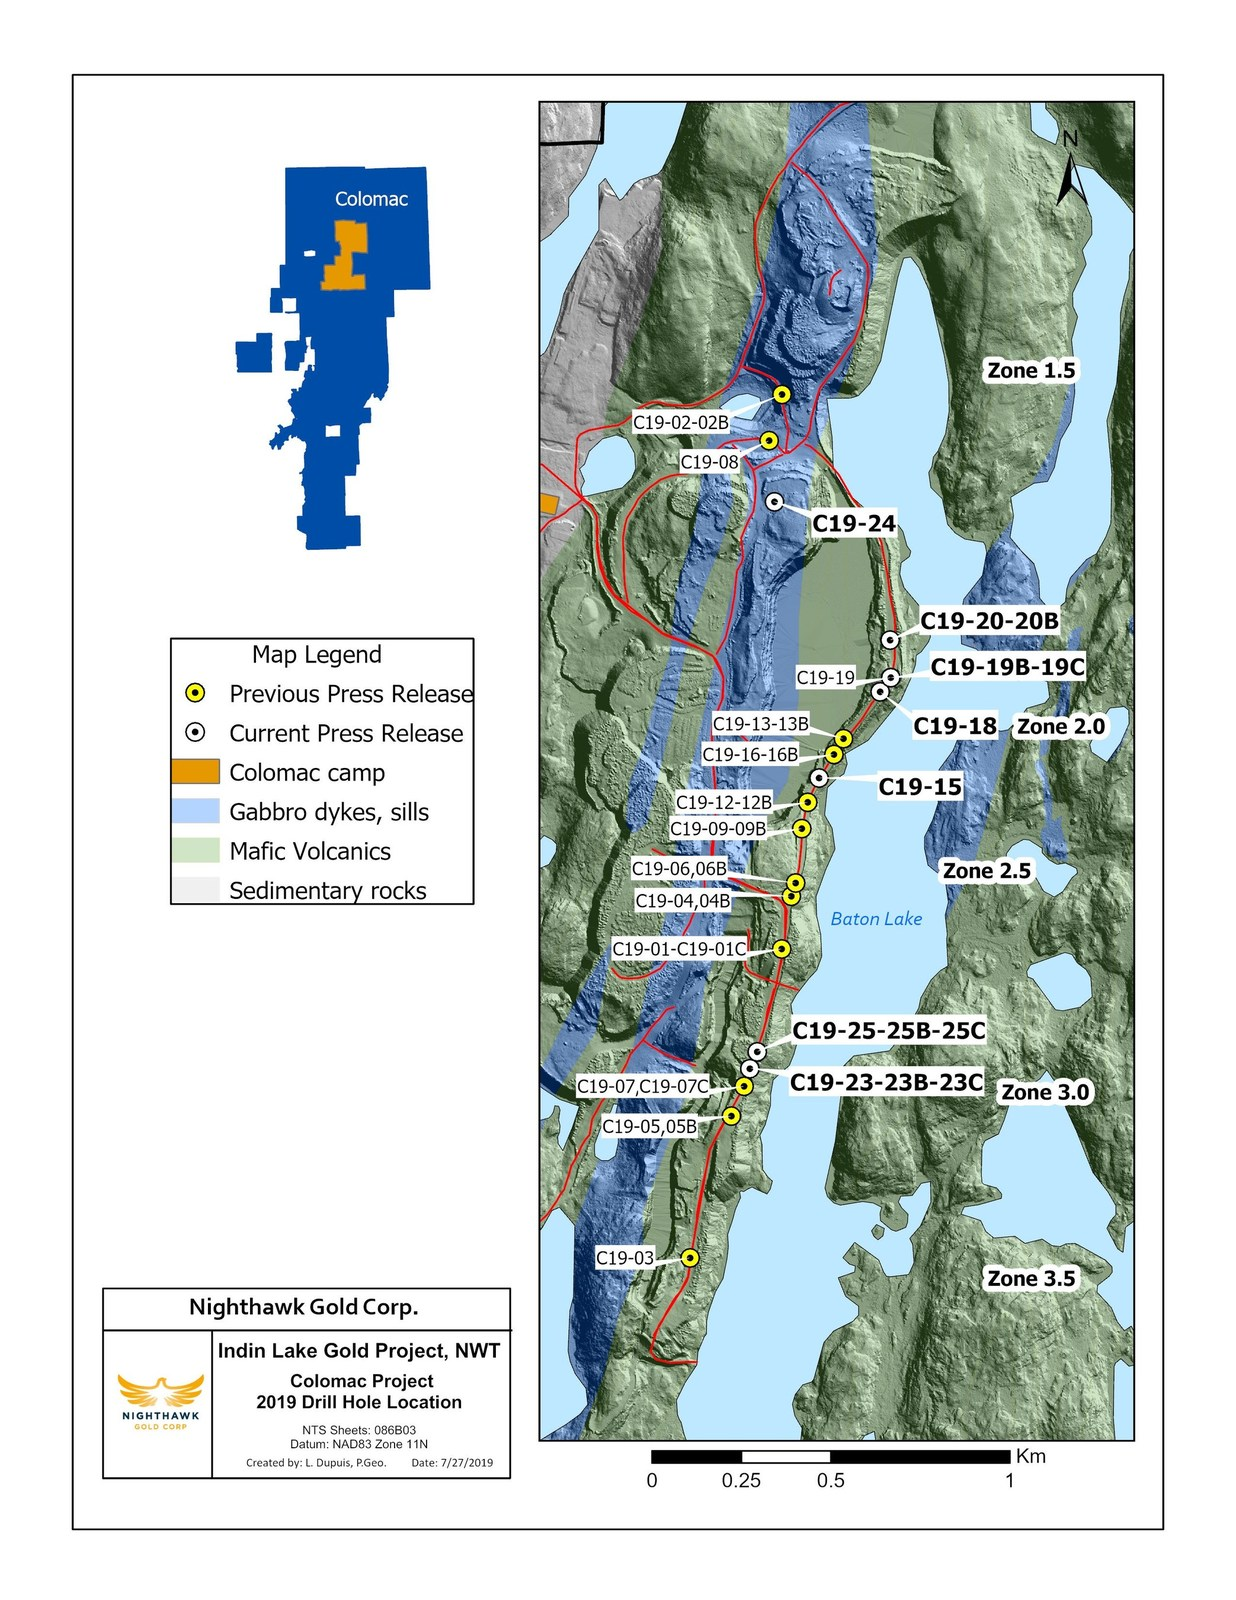 Figure 1.  Plan View - Drillhole Locations